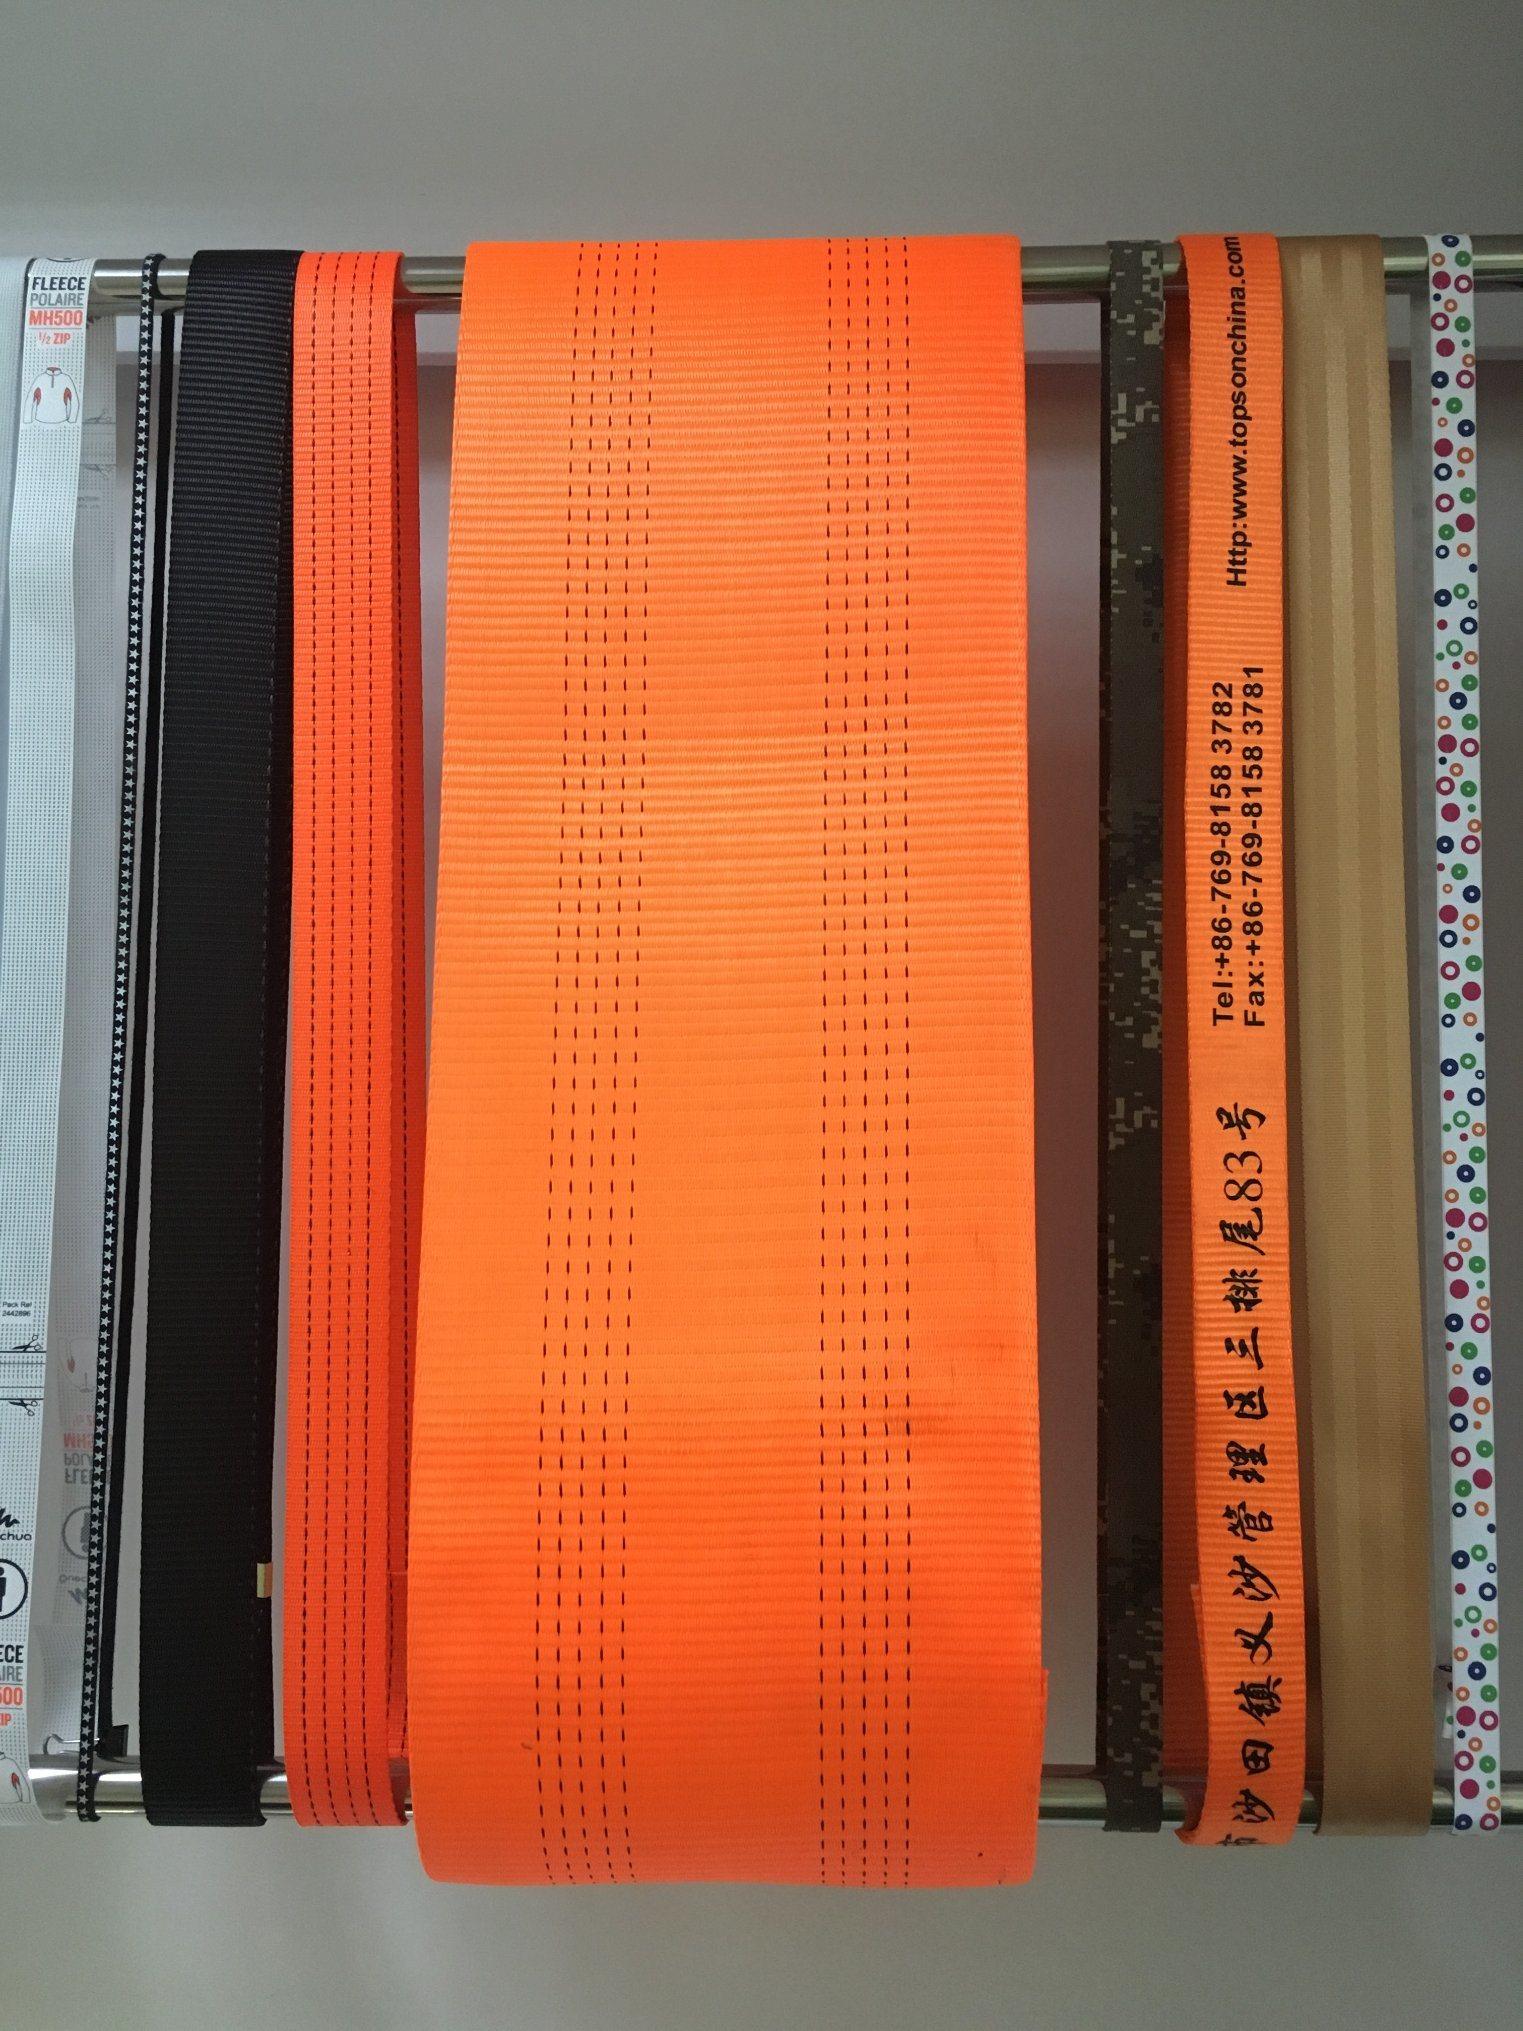 OEM Supply Label Slitting Machine - Industrial Heavy Duty Webbings Screen Printing Machine Ds-302b – Kin Wah